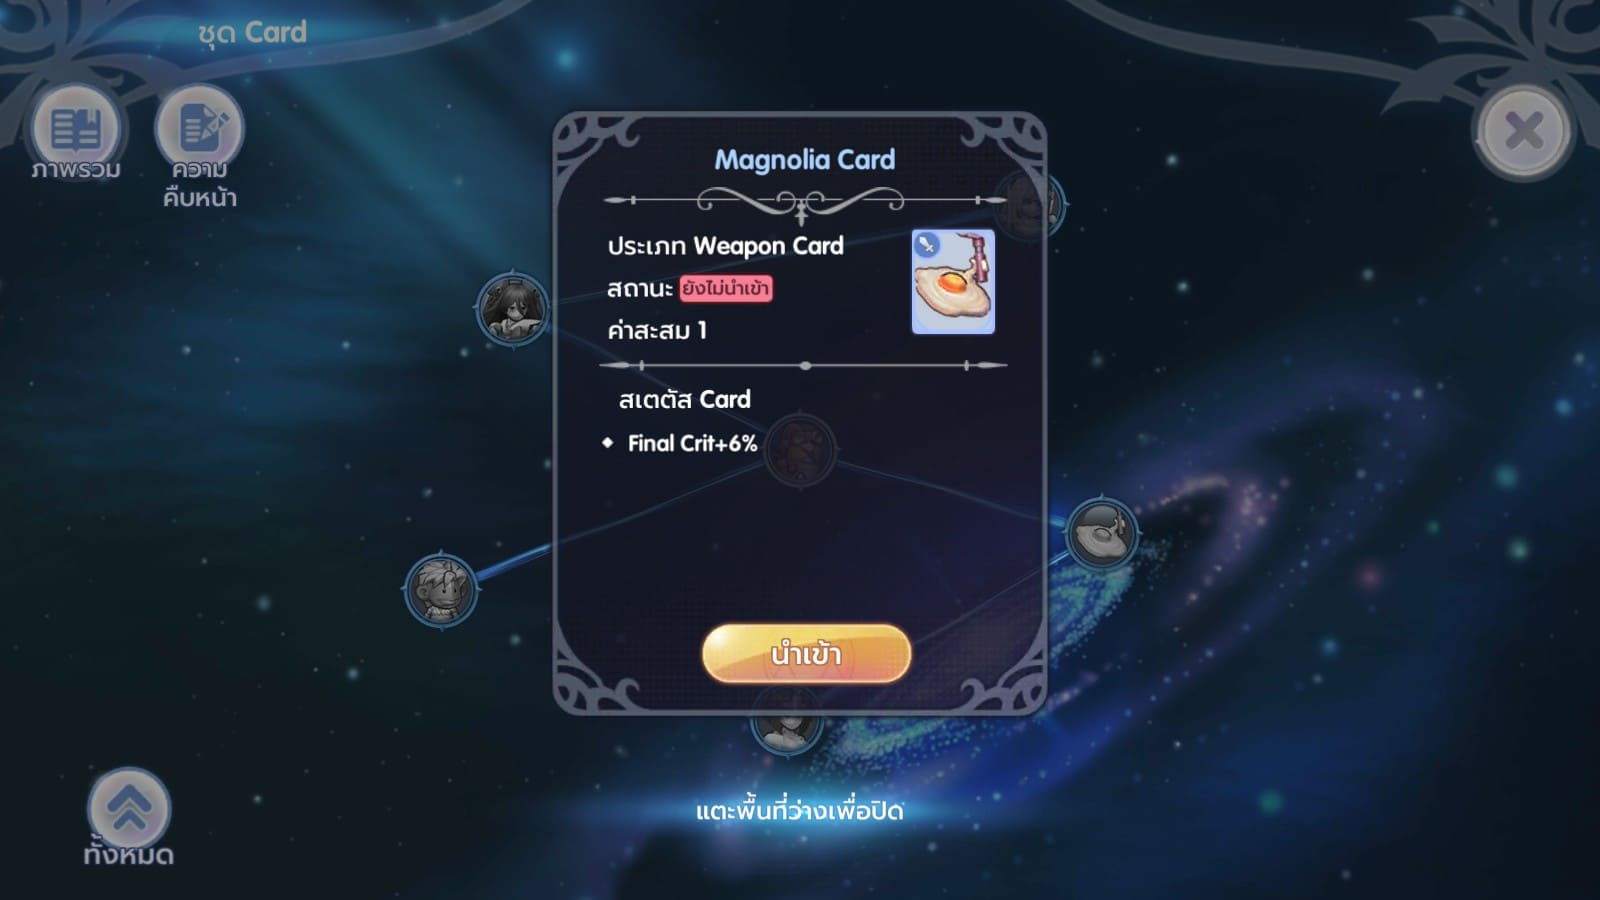 ROX Magnolia Card